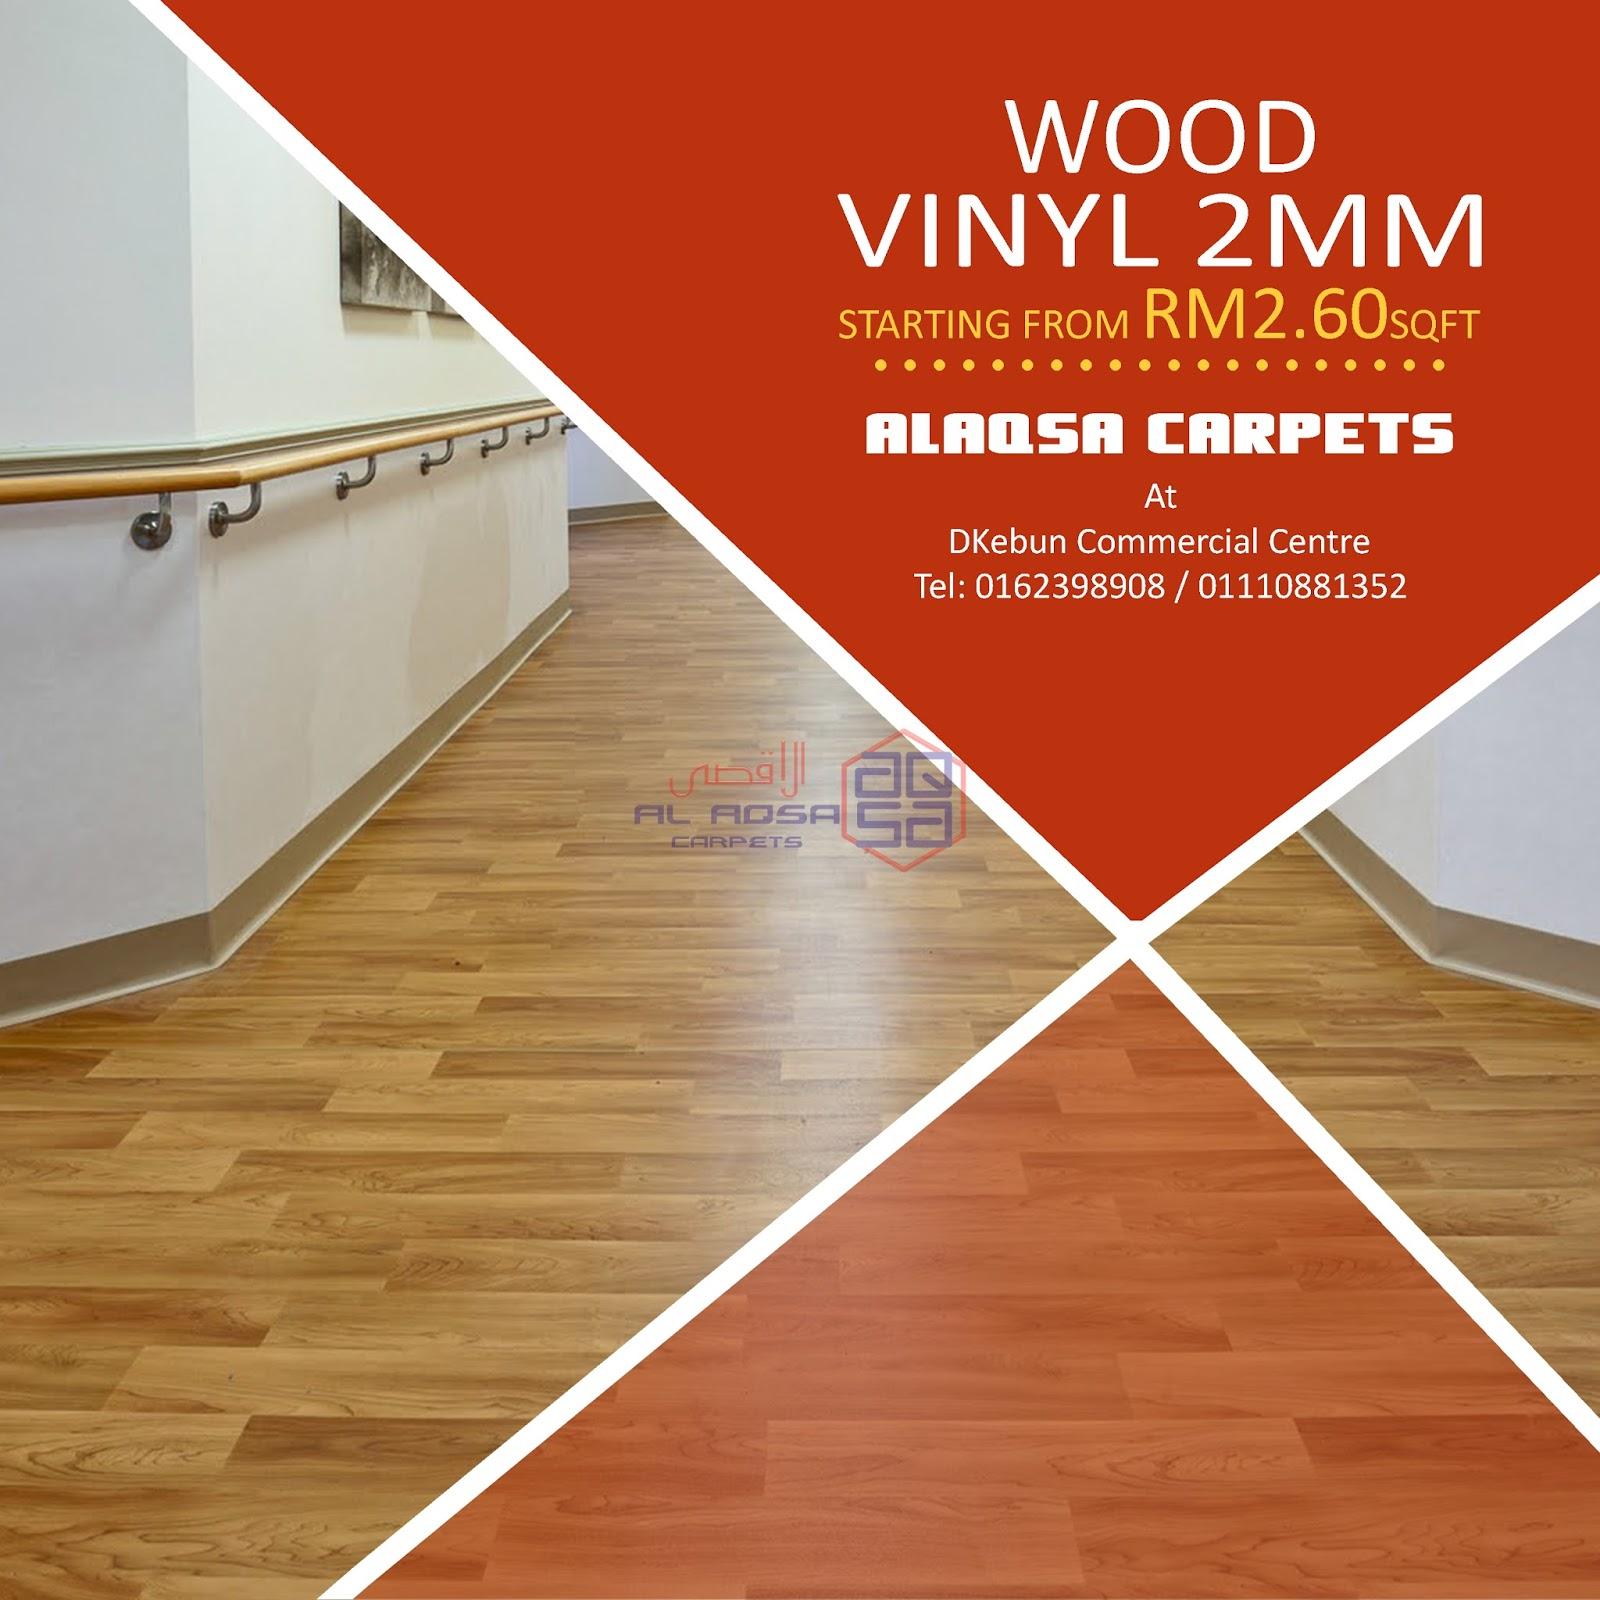 Flooring Supplier In Malaysia Alaqsa Carpets Vinyl